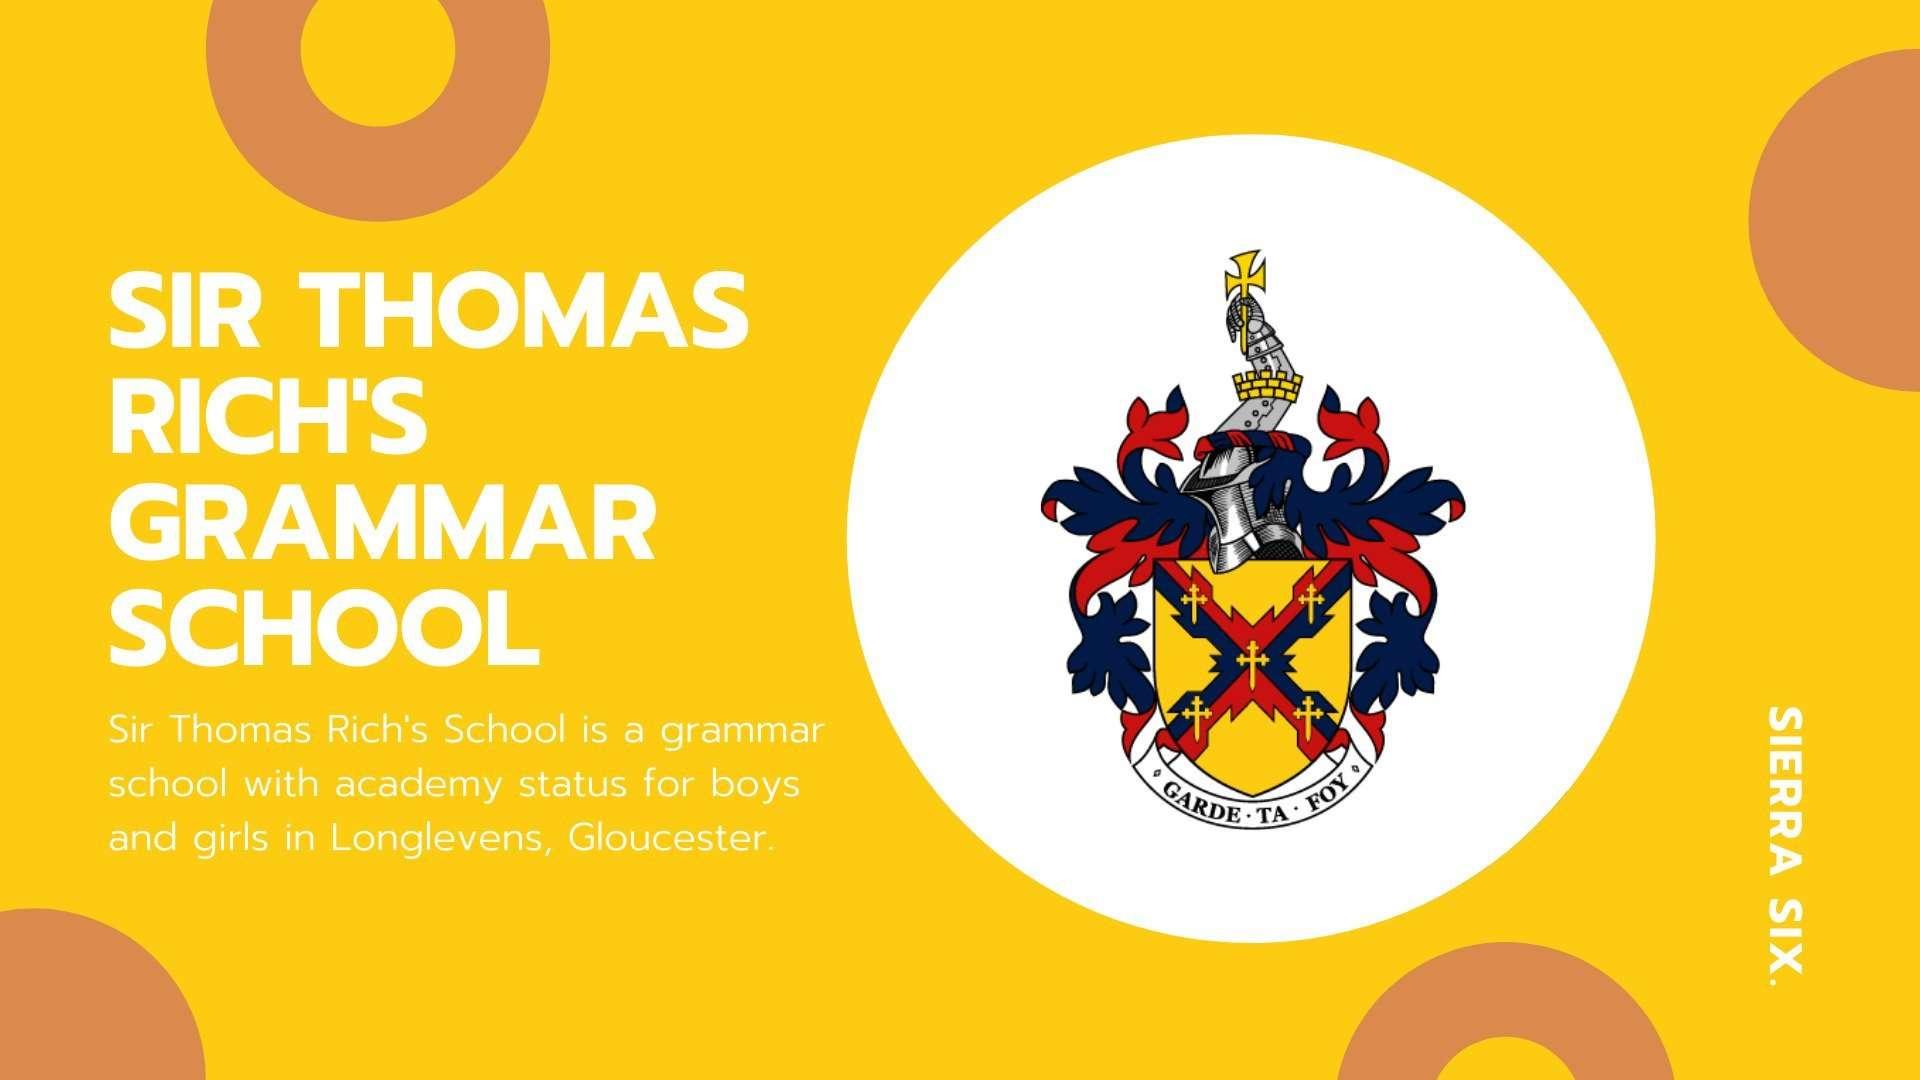 Sierra Six Media, SEO agency in the press: Sir Thomas Rich's School, talk with students.